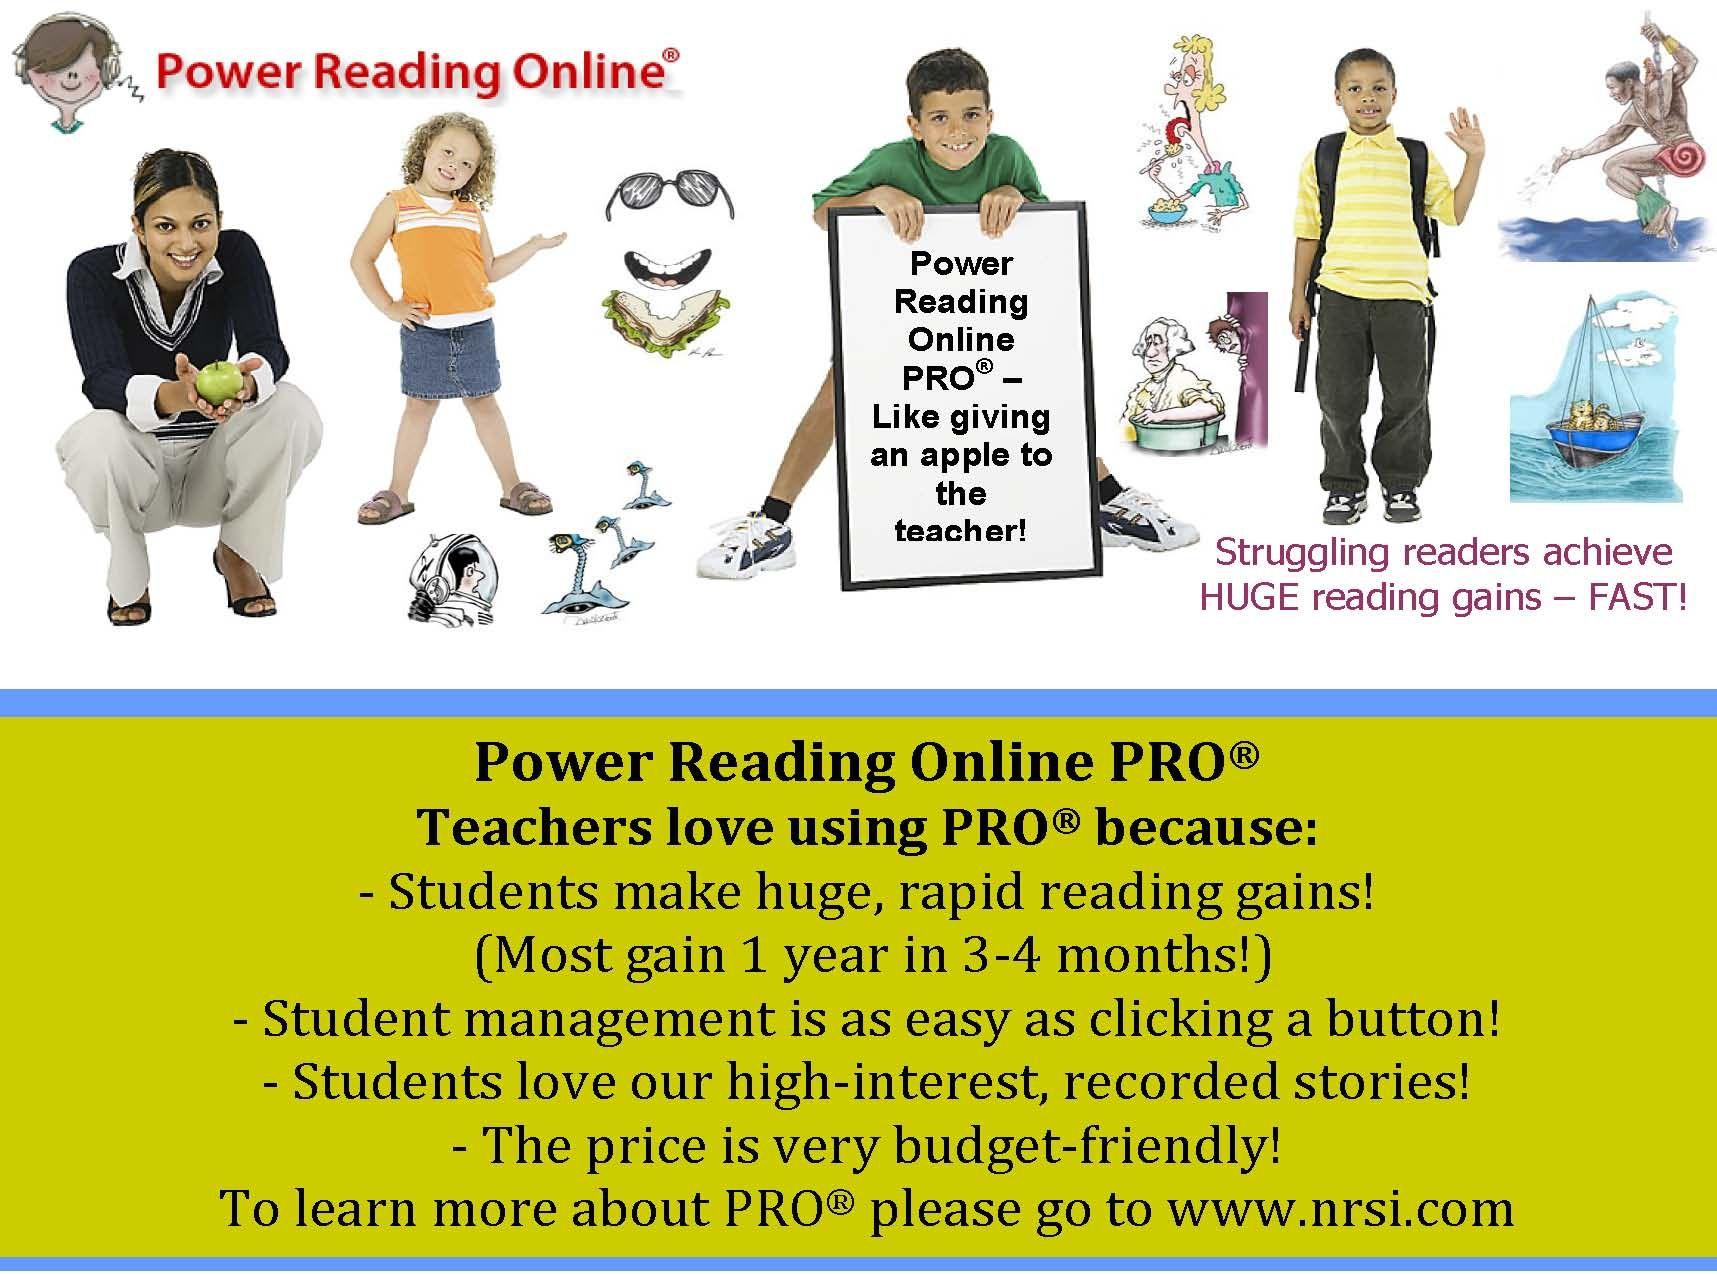 Power Reading Online PRO - K-12 The best online reading